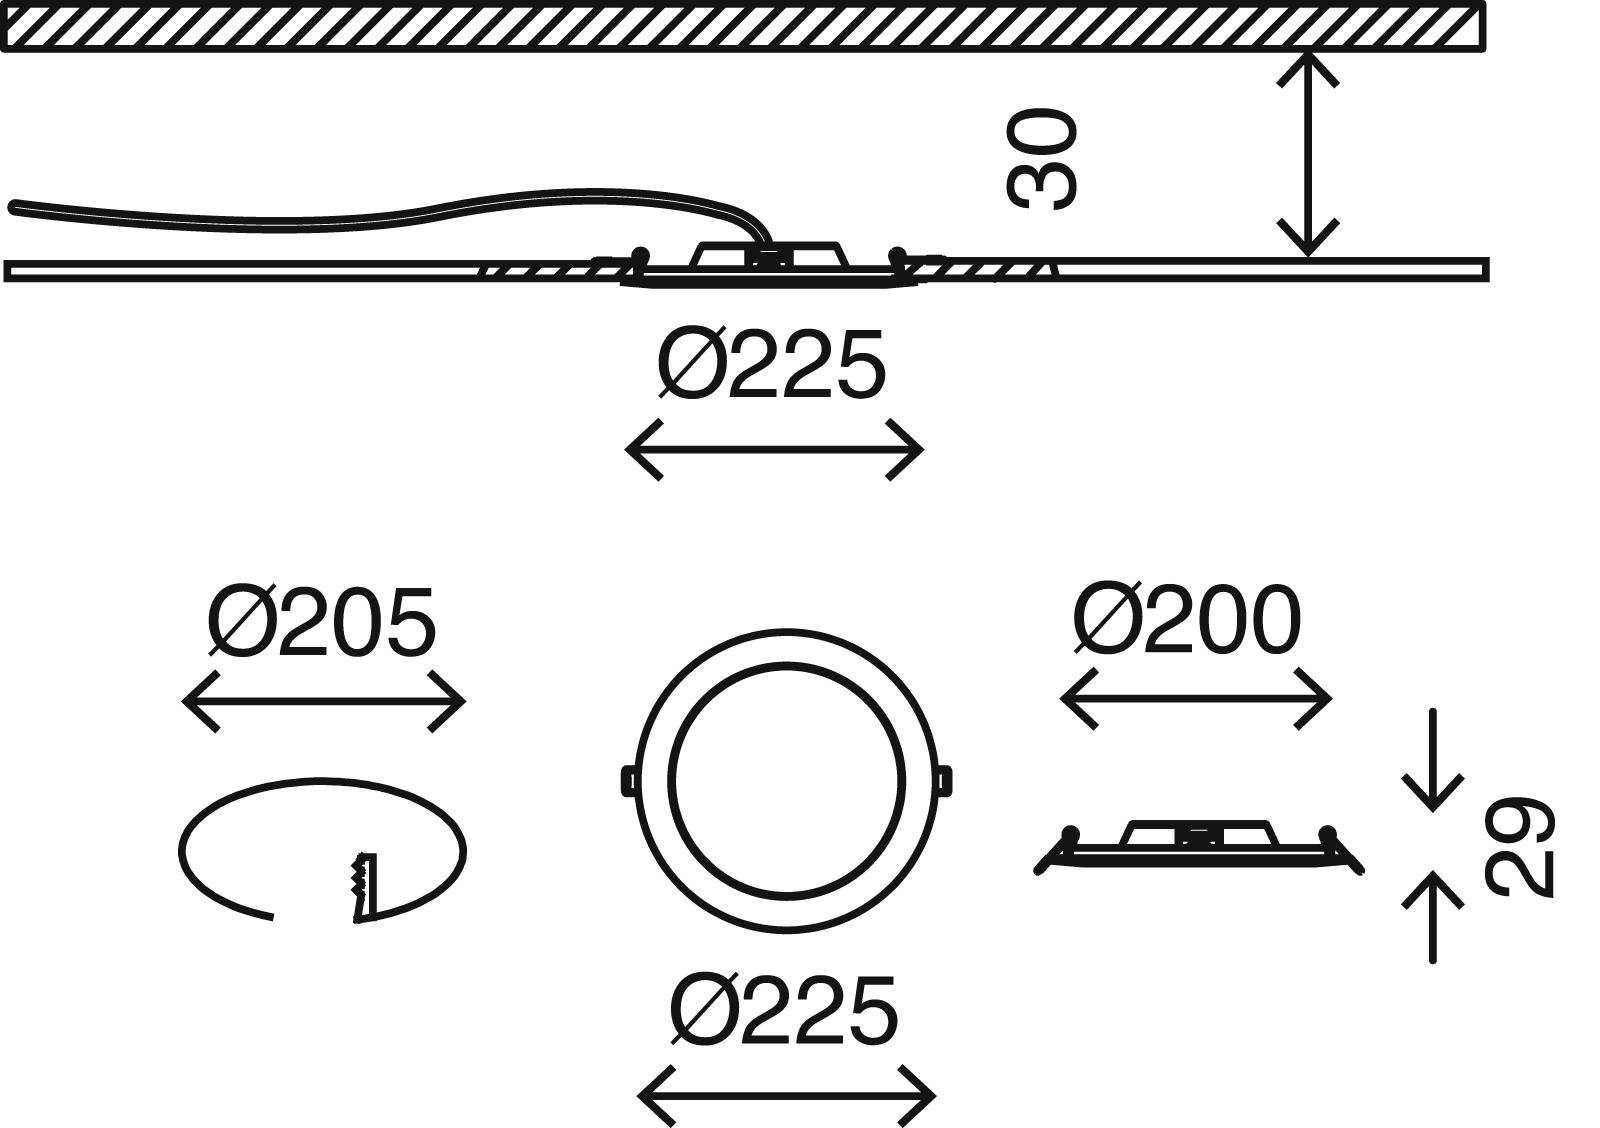 LED Einbaustrahler, Ø 22,5 cm, 18 W, Weiß